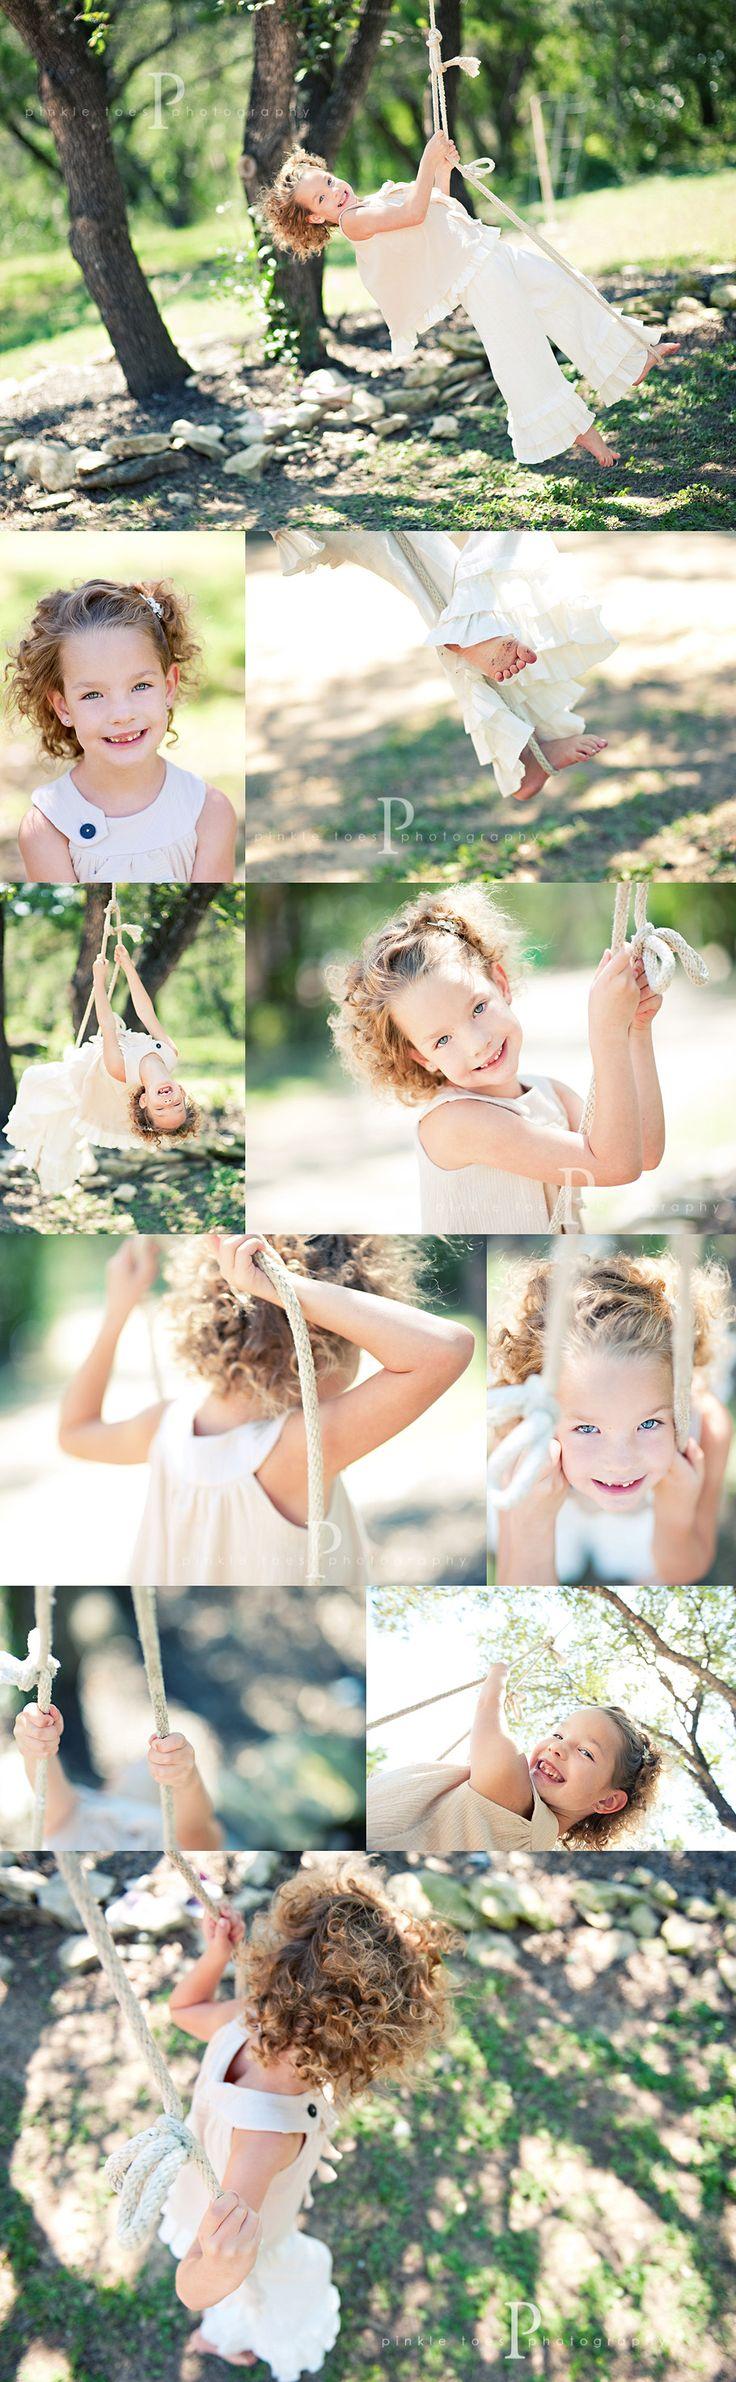 beautiful children's images